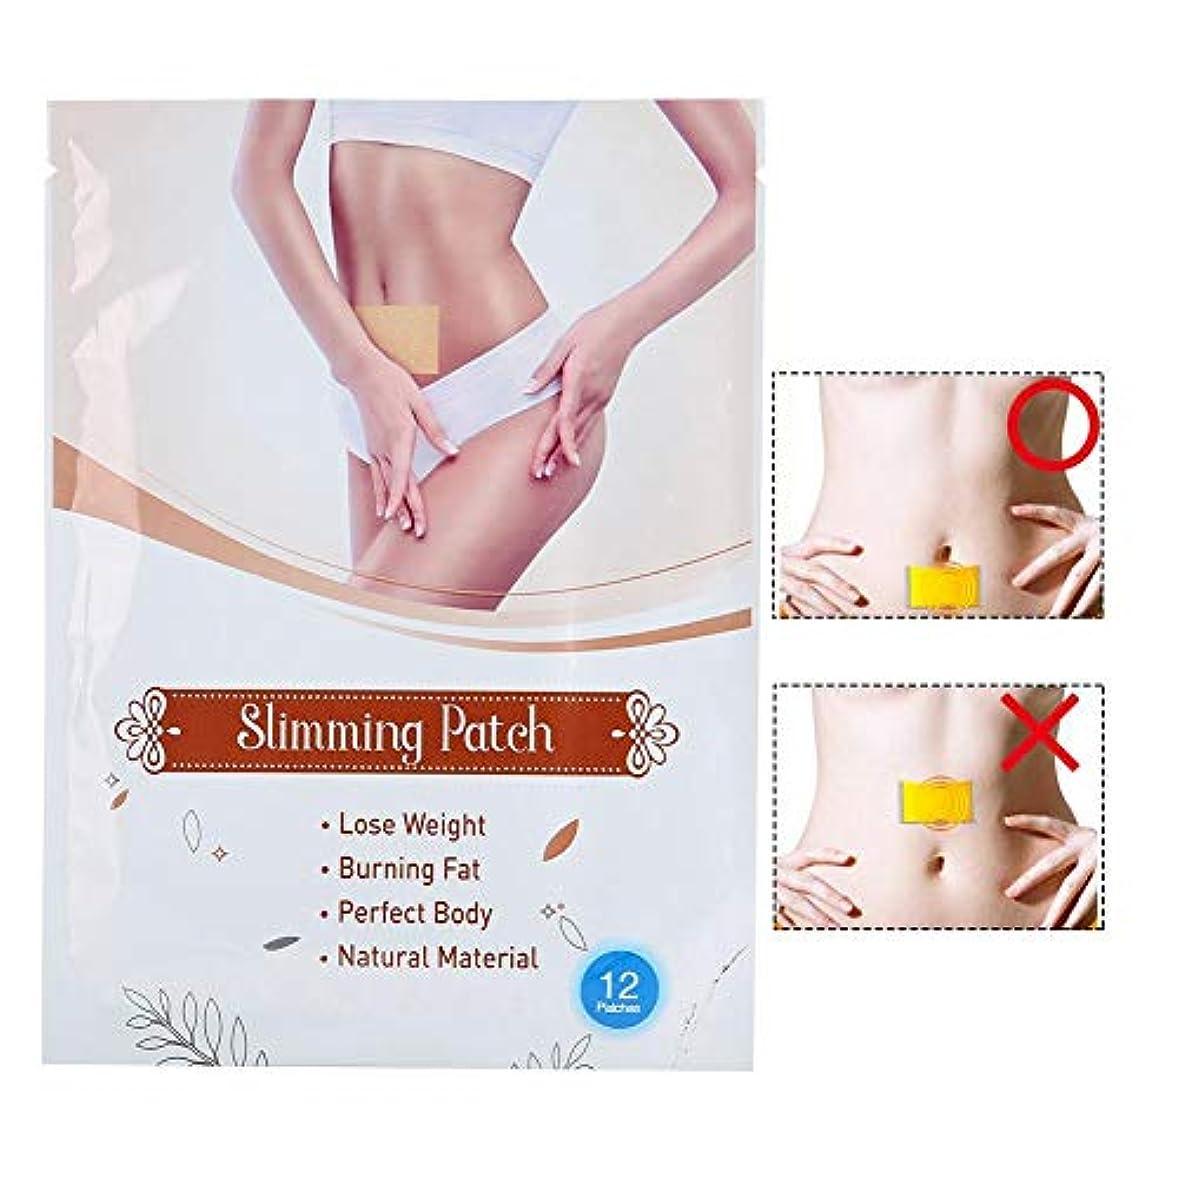 12PCS痩身ステッカー - 体脂肪バーナー - 減量デトックス、スリムパッチ - 男性と女性用